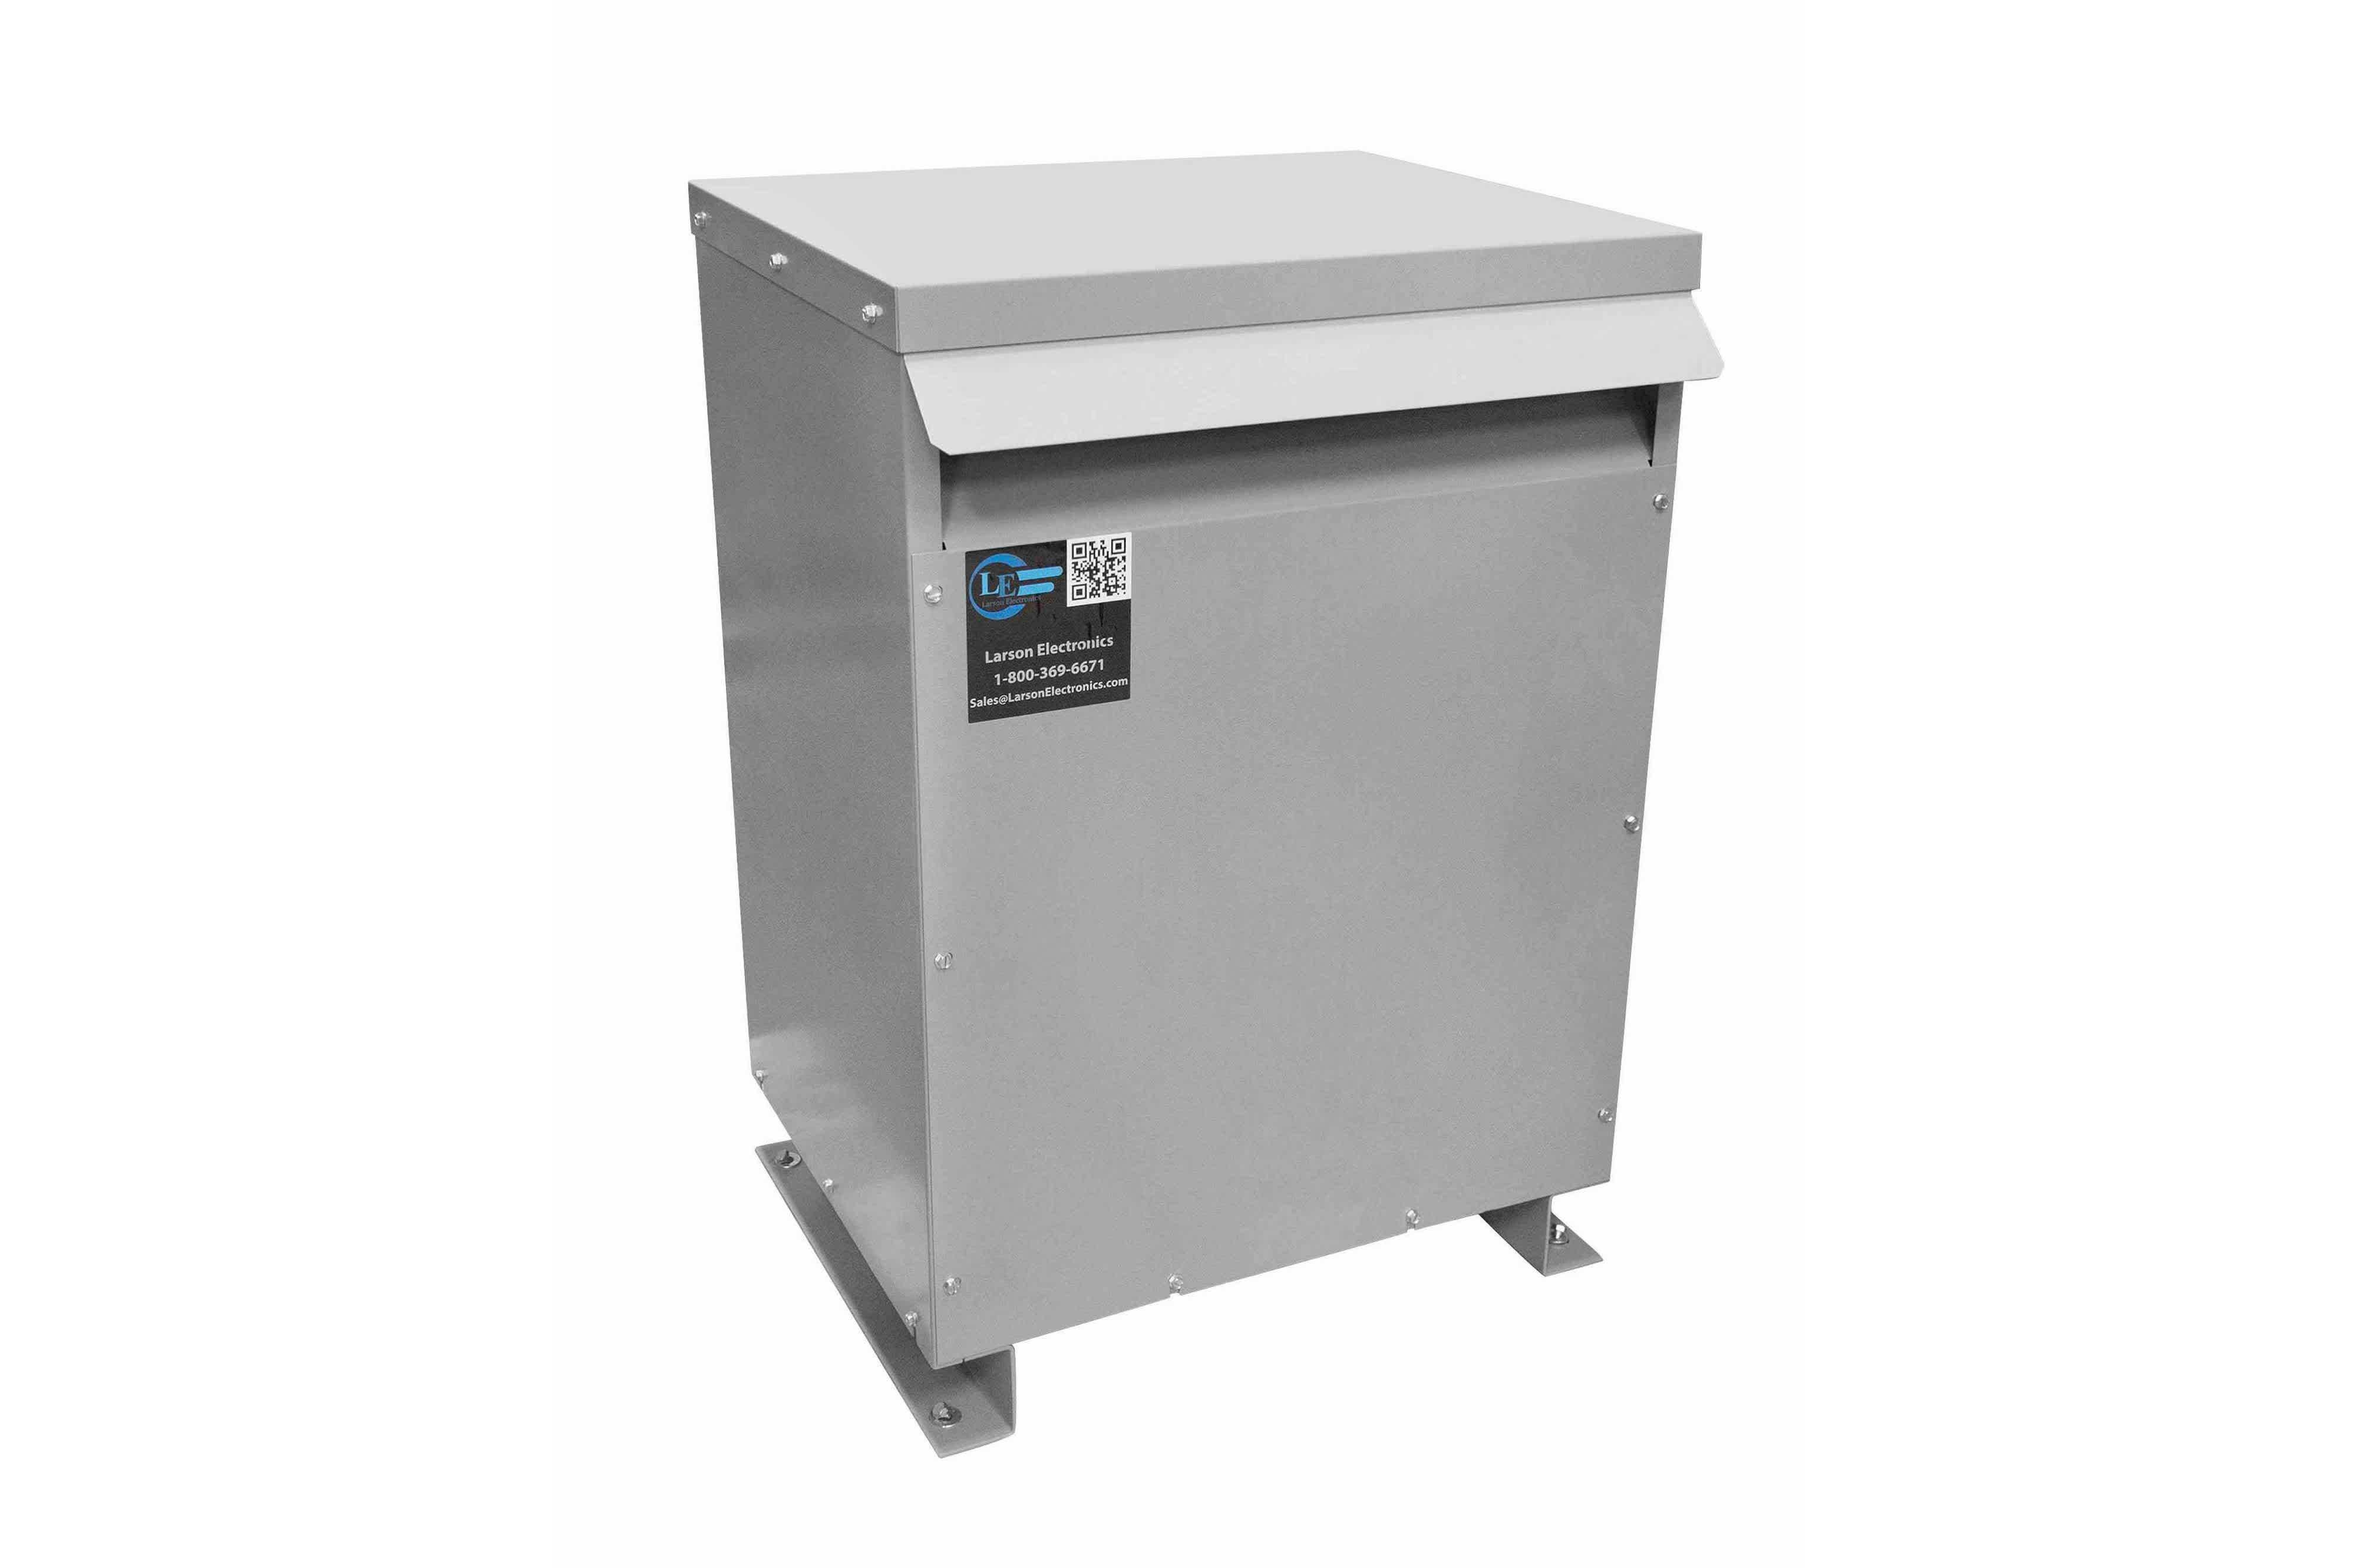 11 kVA 3PH Isolation Transformer, 460V Wye Primary, 380V Delta Secondary, N3R, Ventilated, 60 Hz